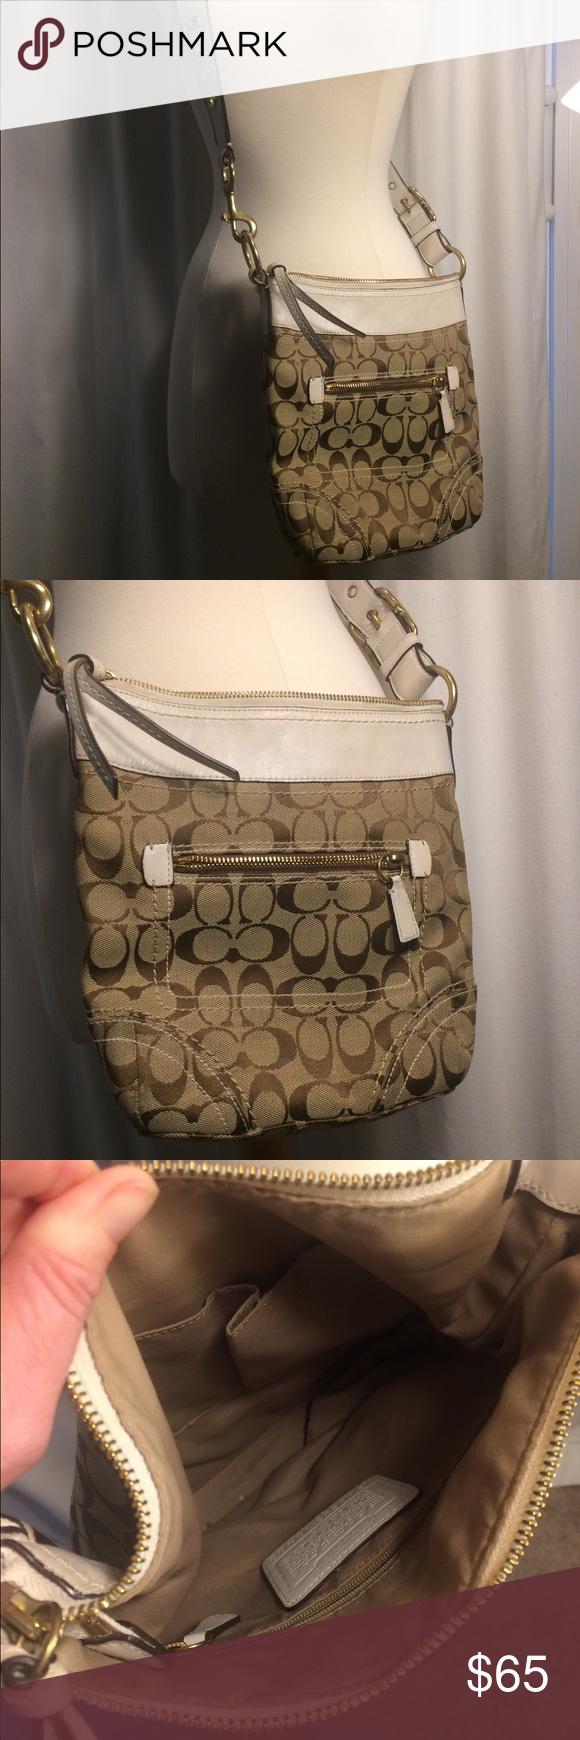 5bda31c86708 Coach signature crossbody bucket bag h0685 Beige and white style   h0685-10402  Coach Bags Crossbody Bags